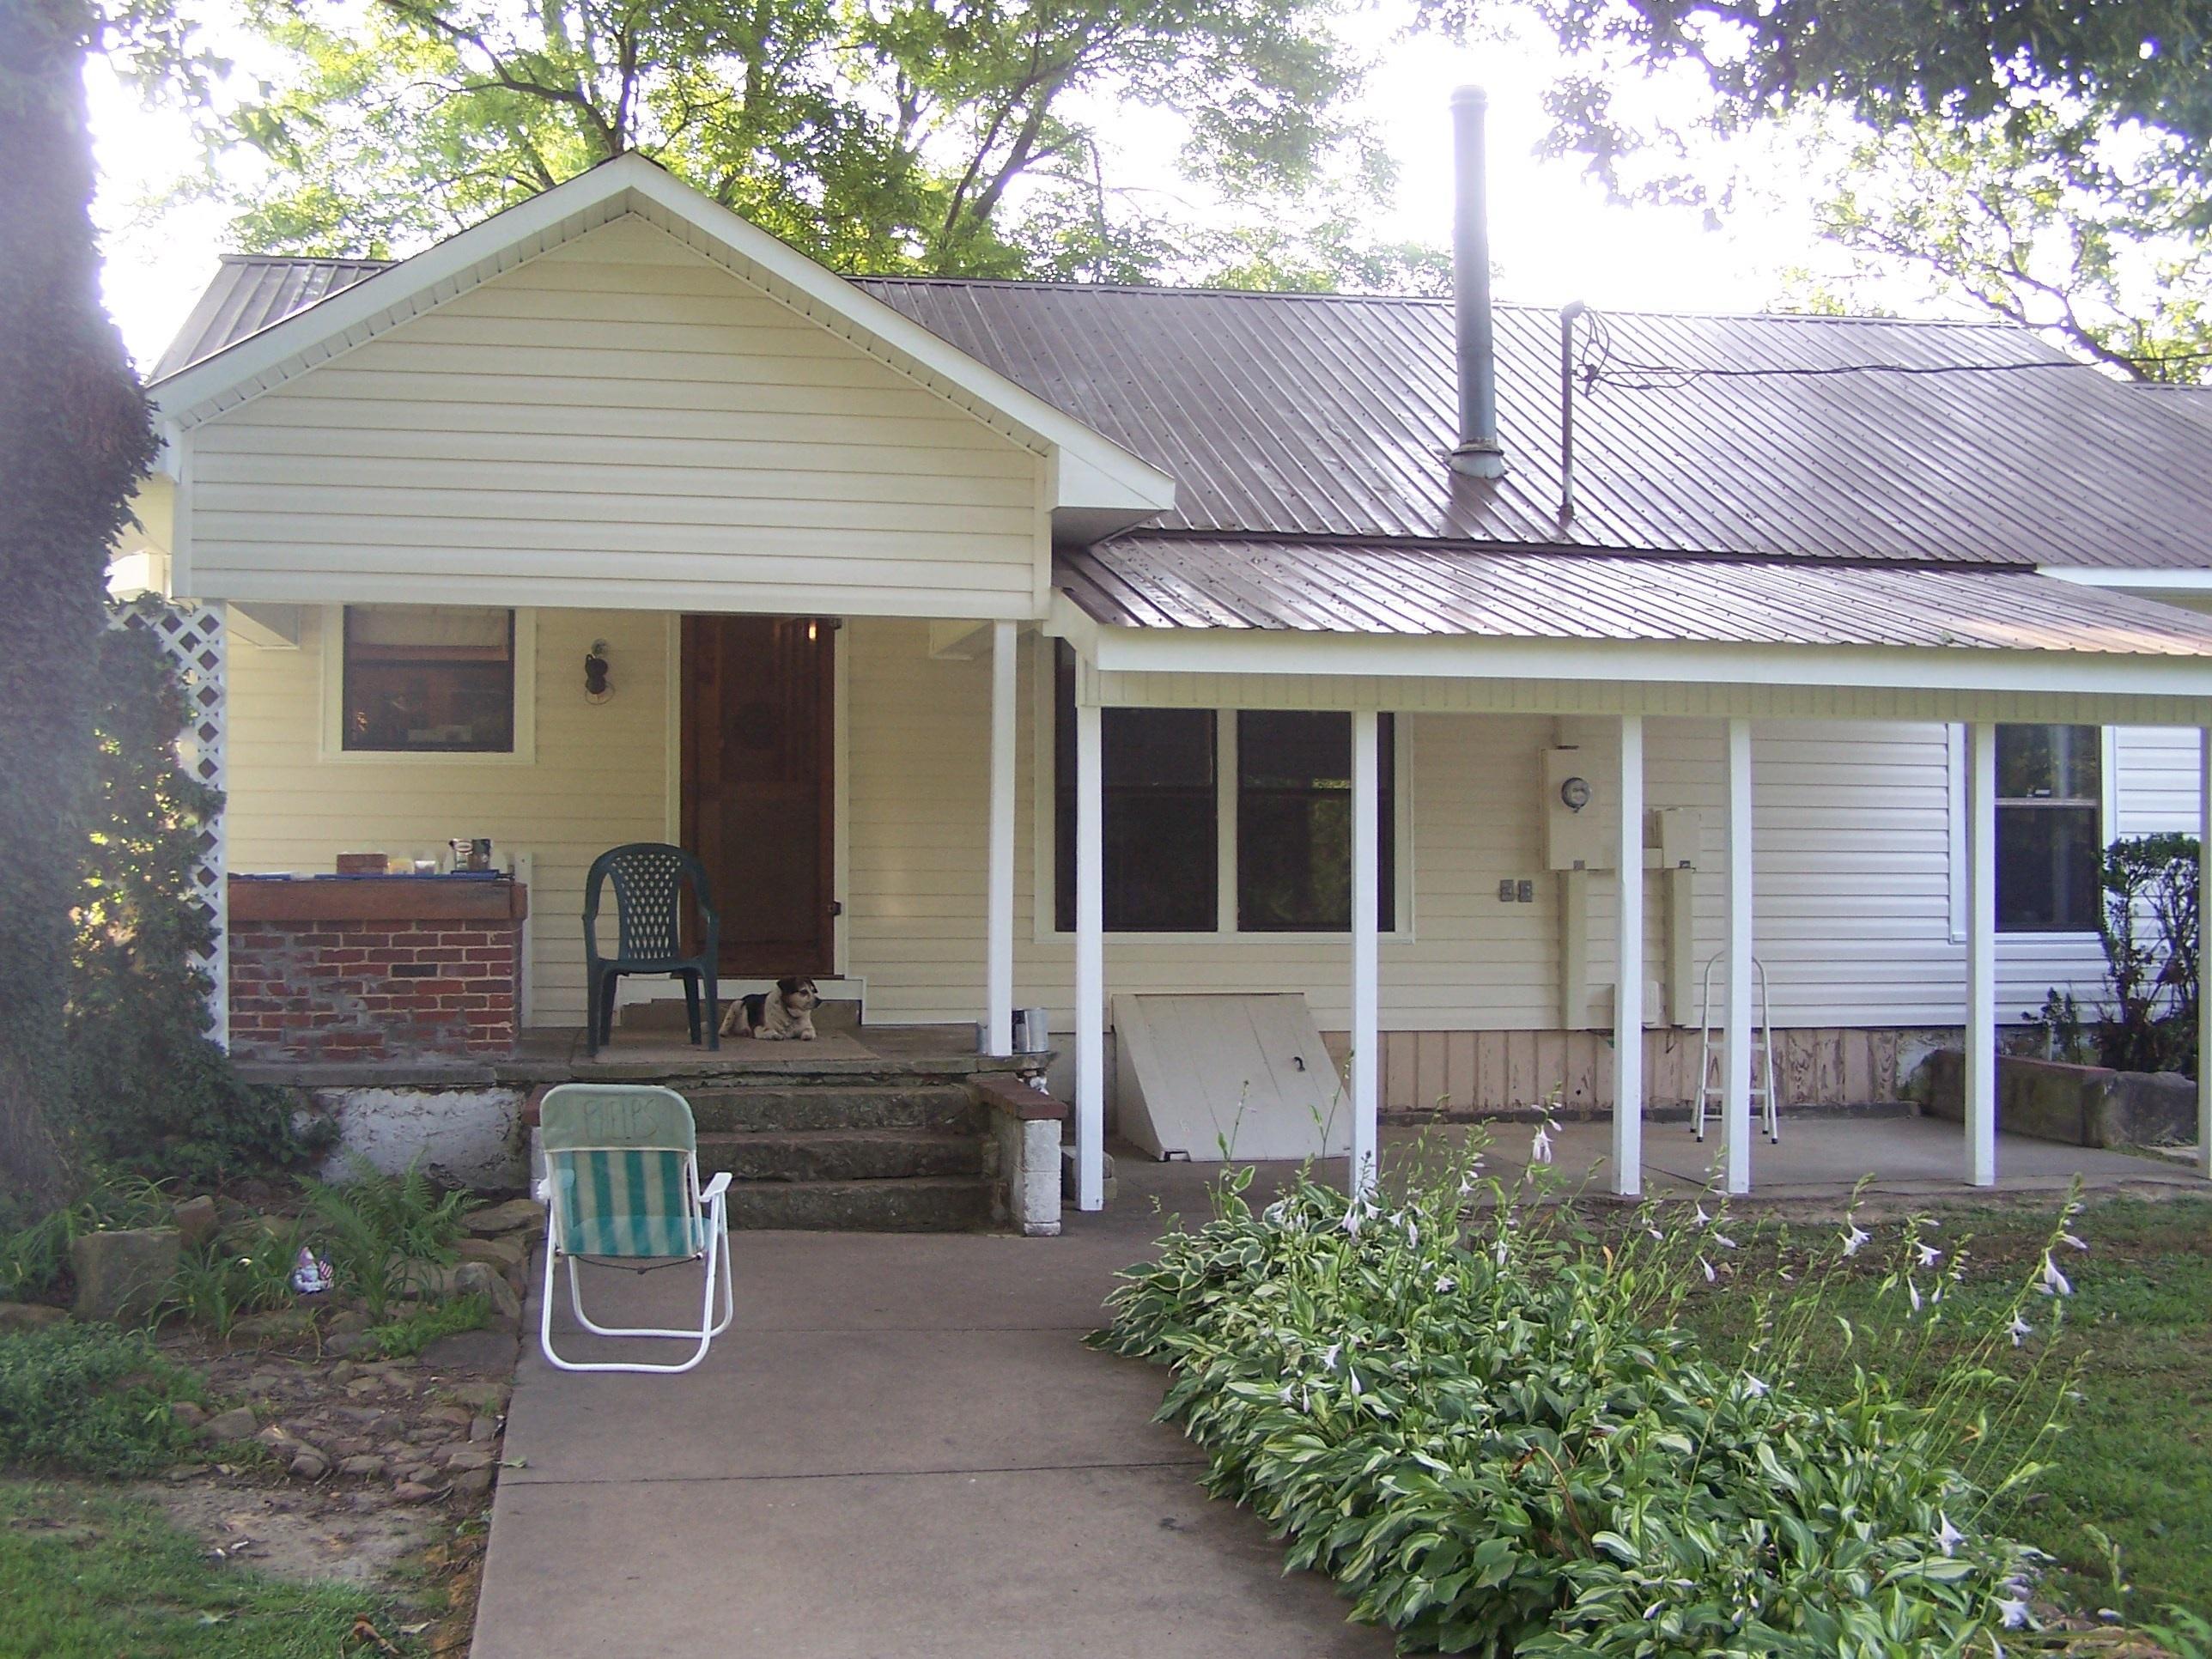 North Alabama Home Maintenance